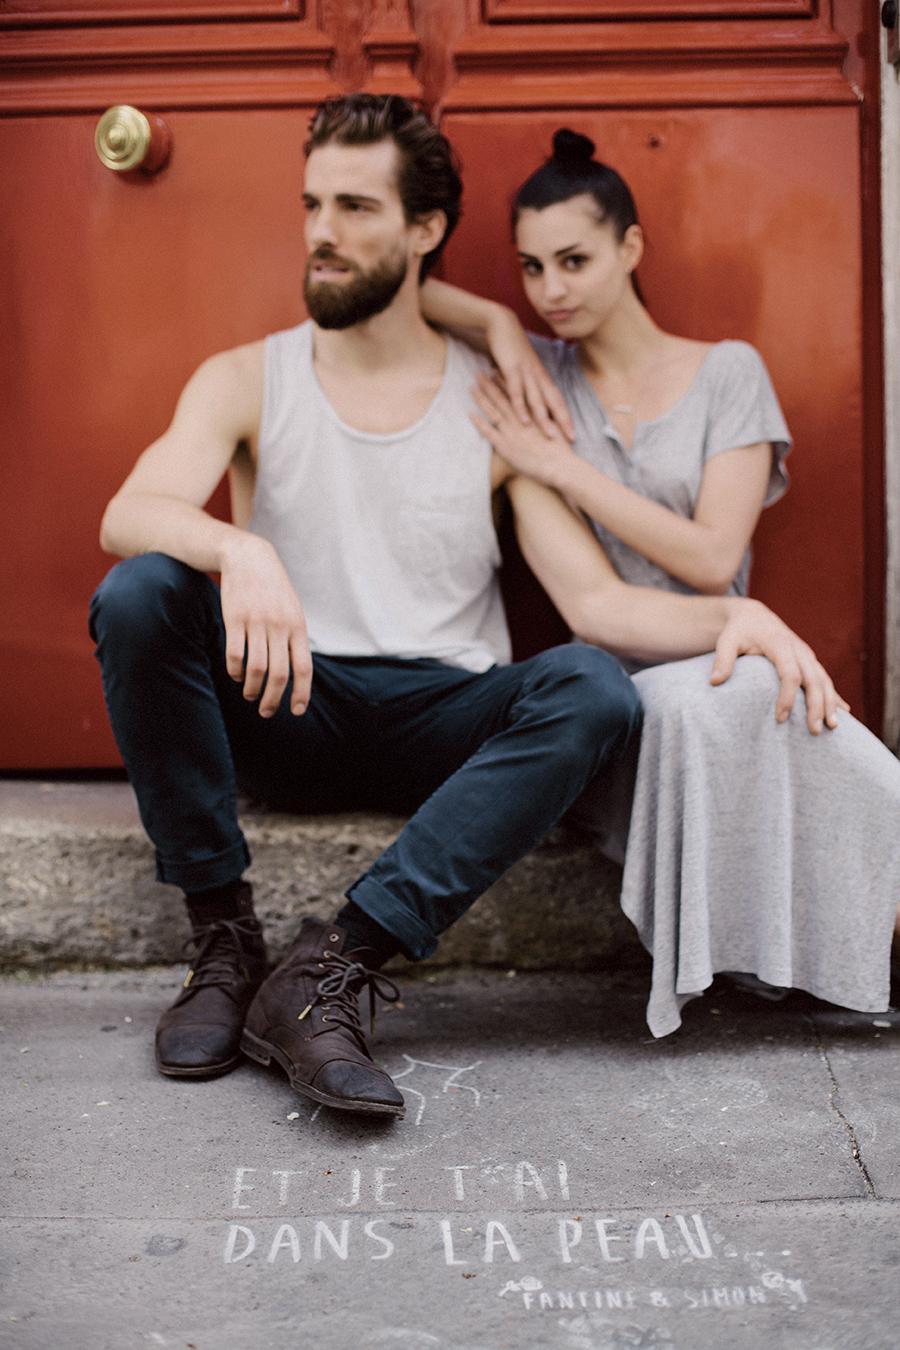 fantine_et_simon_street_art_couple_artistes